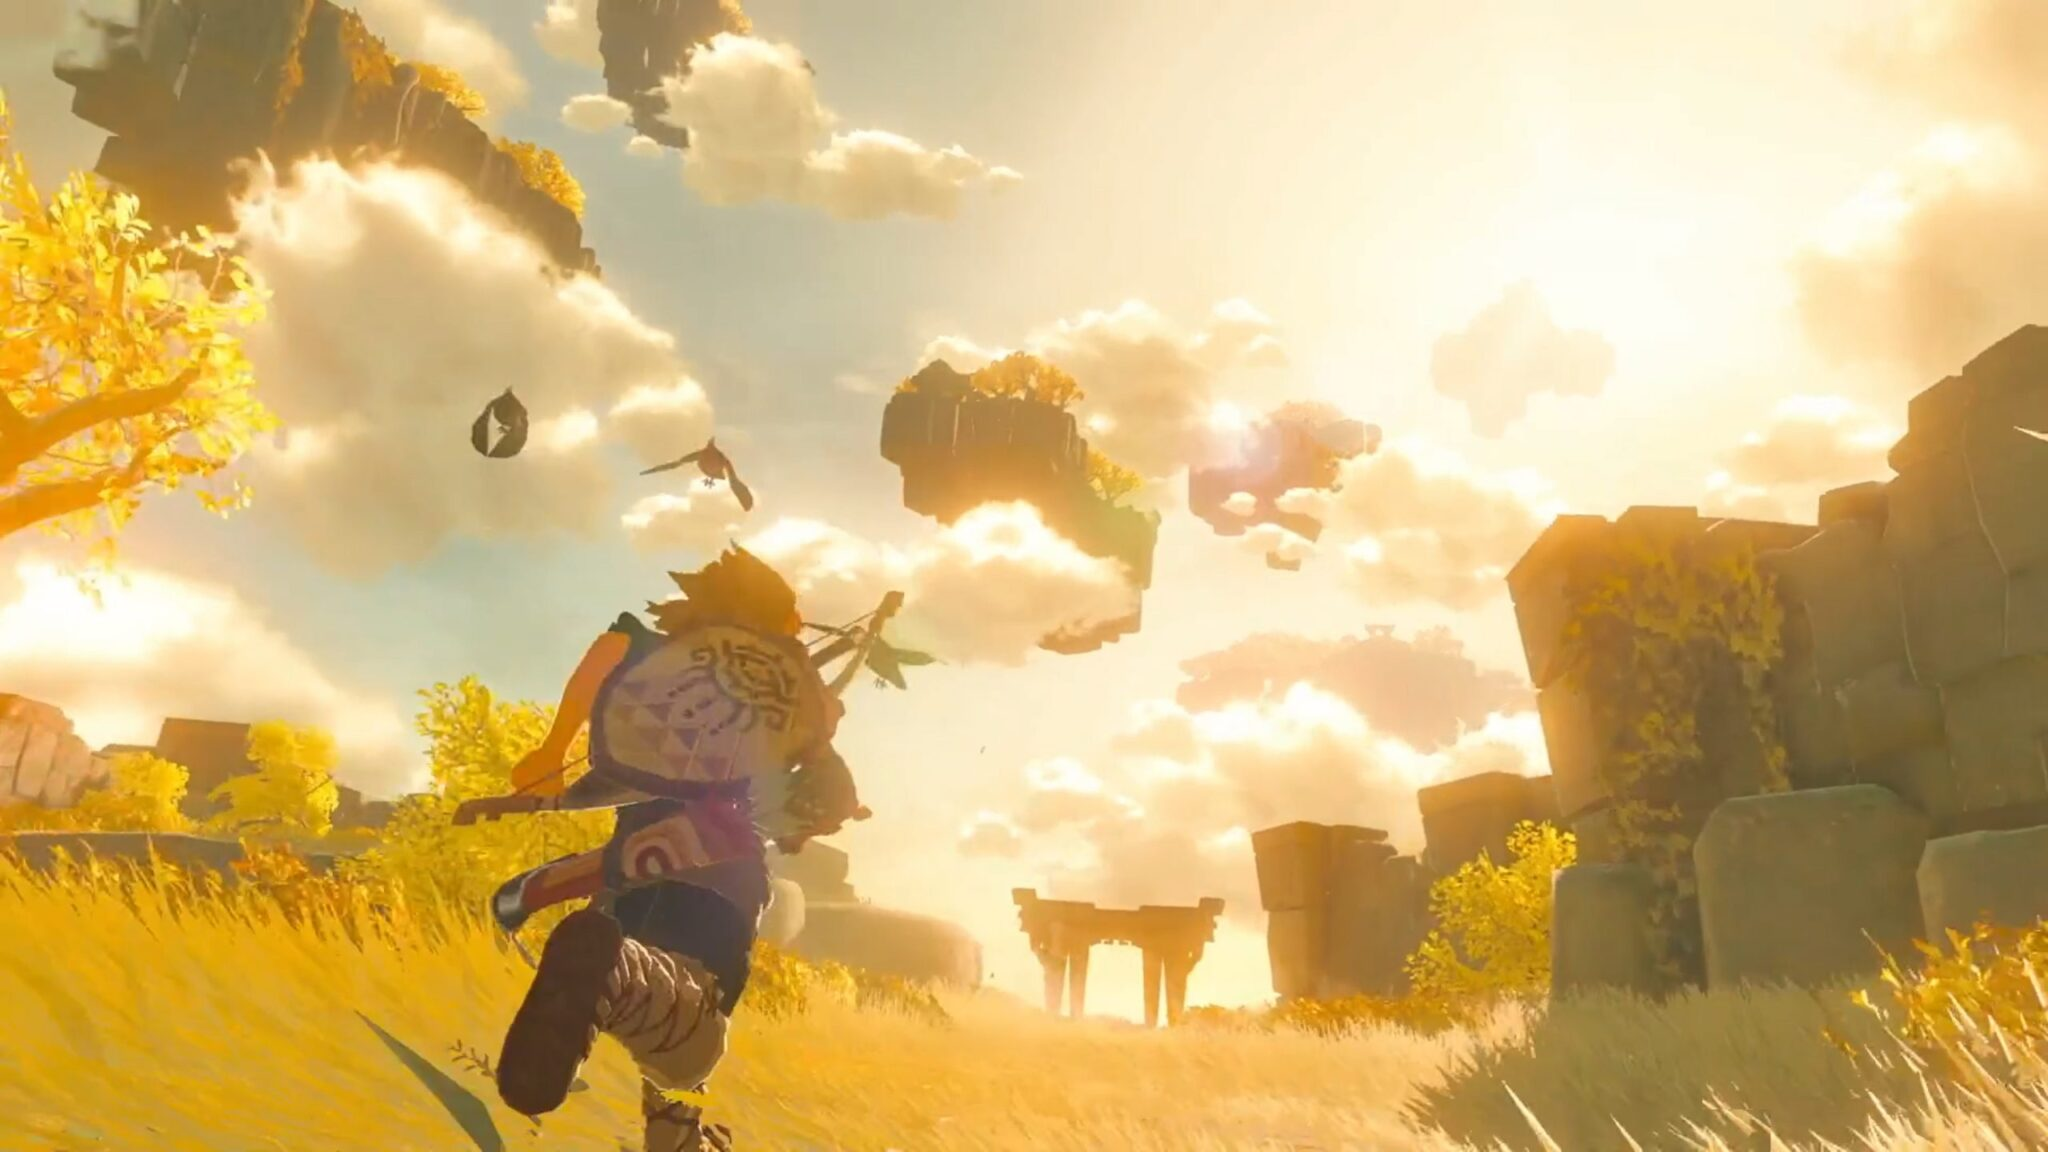 E3 2021 | تریلری جدید و زیبا از بازی Zelda: Breath of the Wild 2 منتشر شد